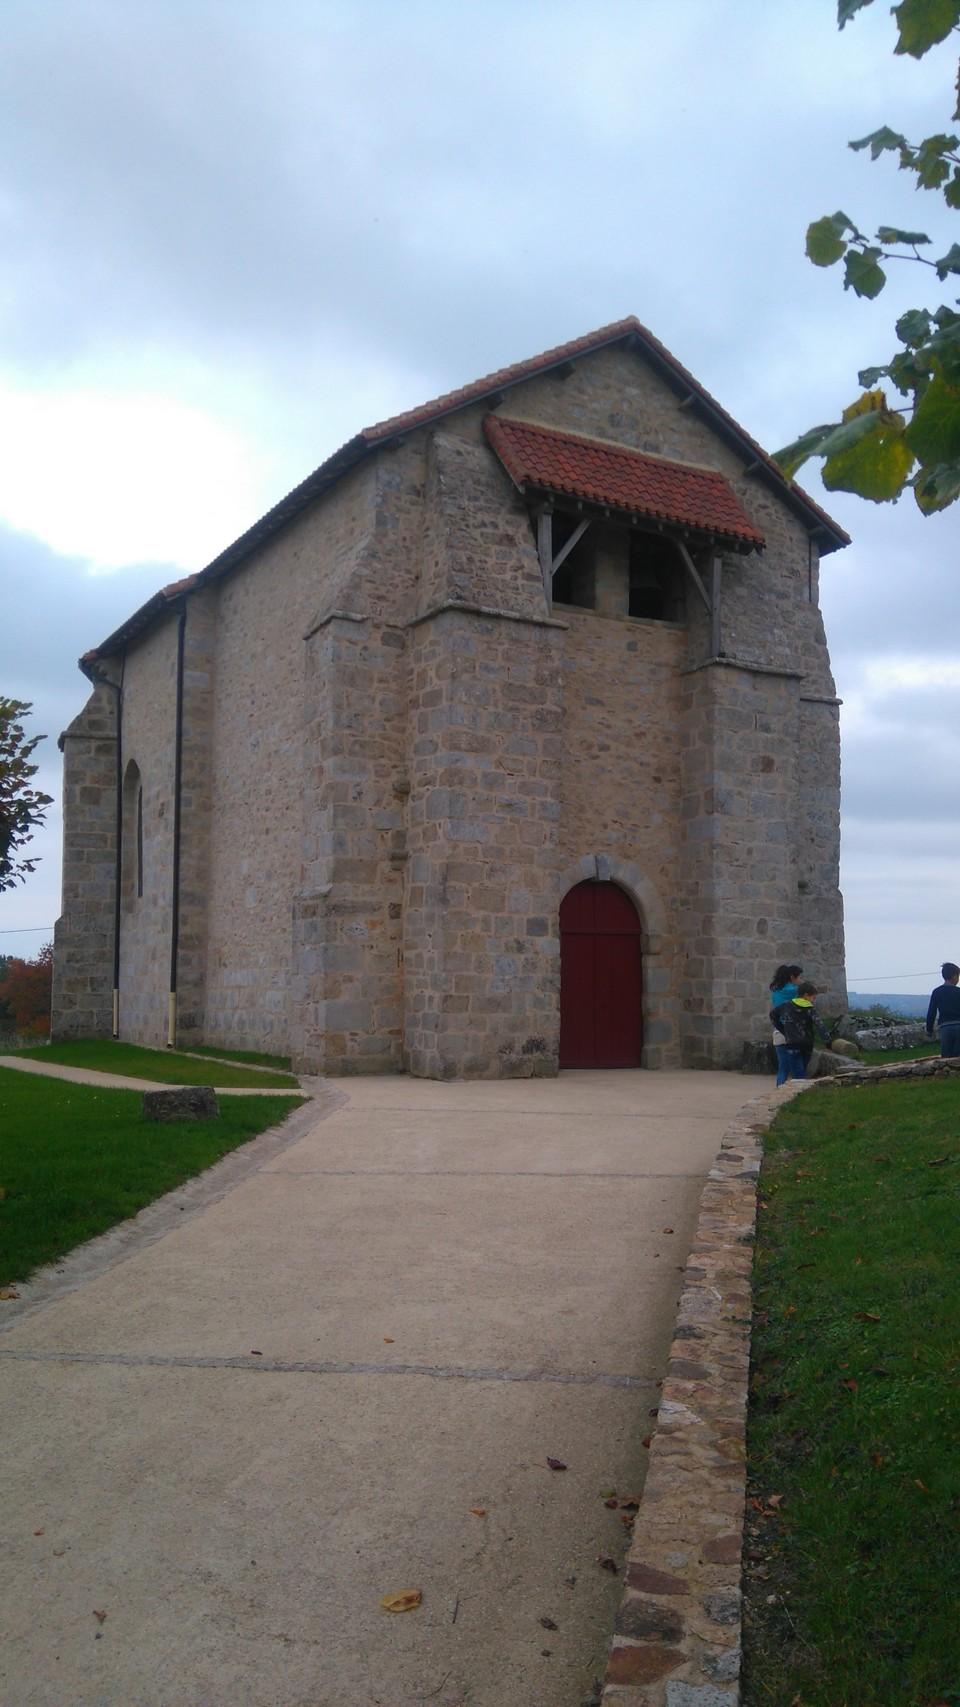 eglise-de-saint-nicolas-de-courbefy